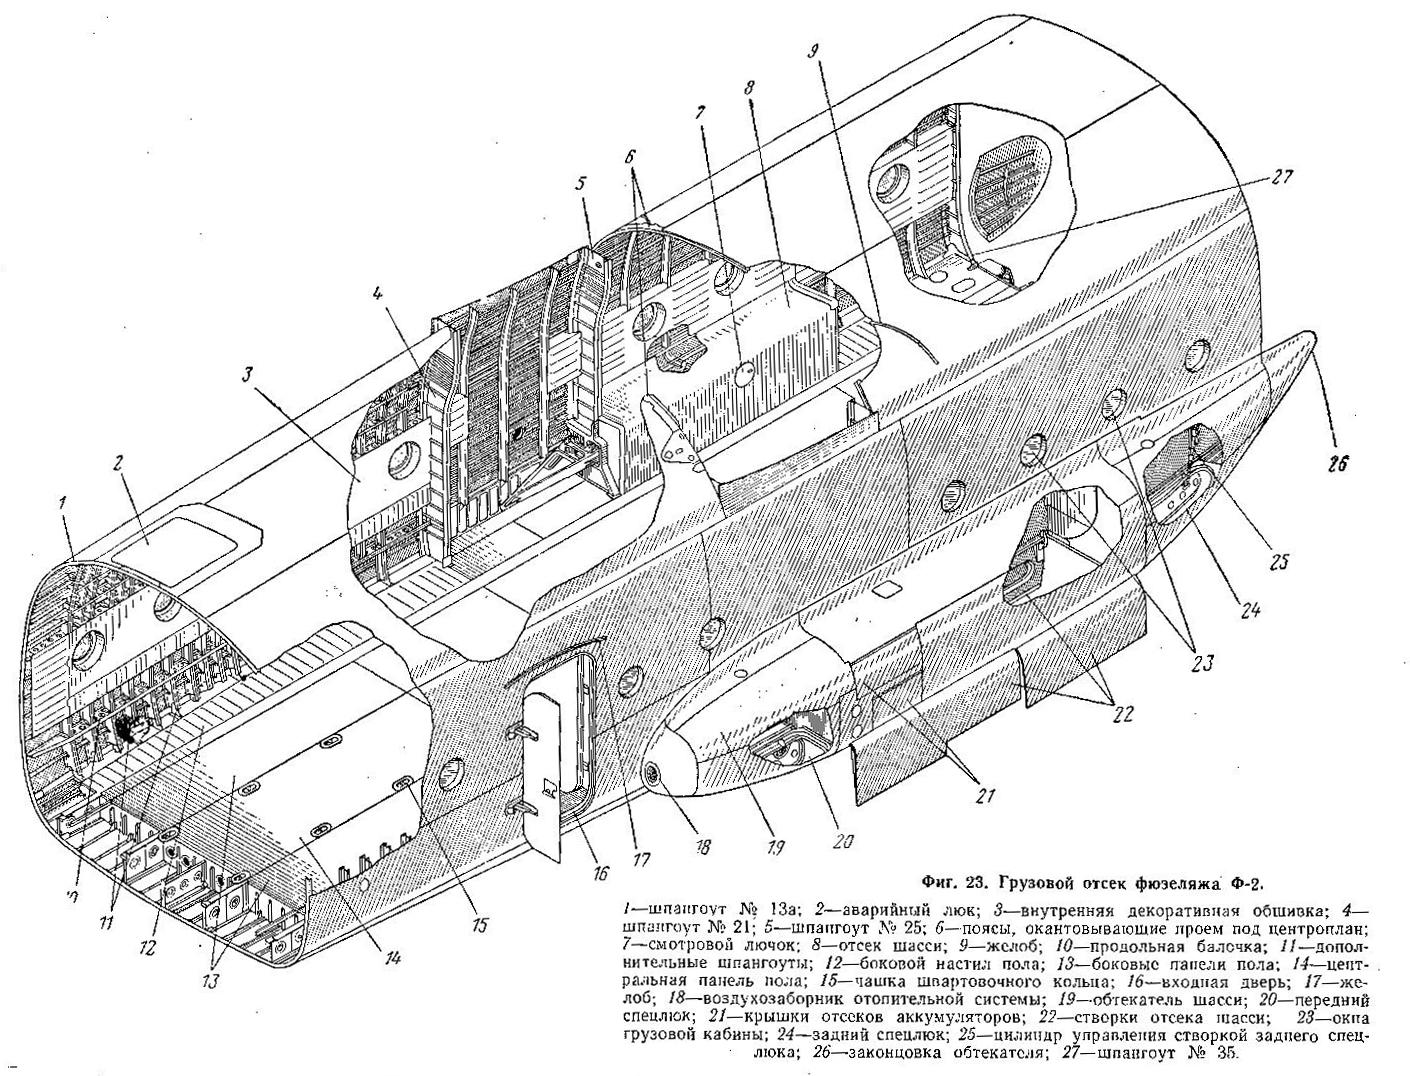 Sextant Blog: 31.) Aн-8 Антонов _ Antonov An-8